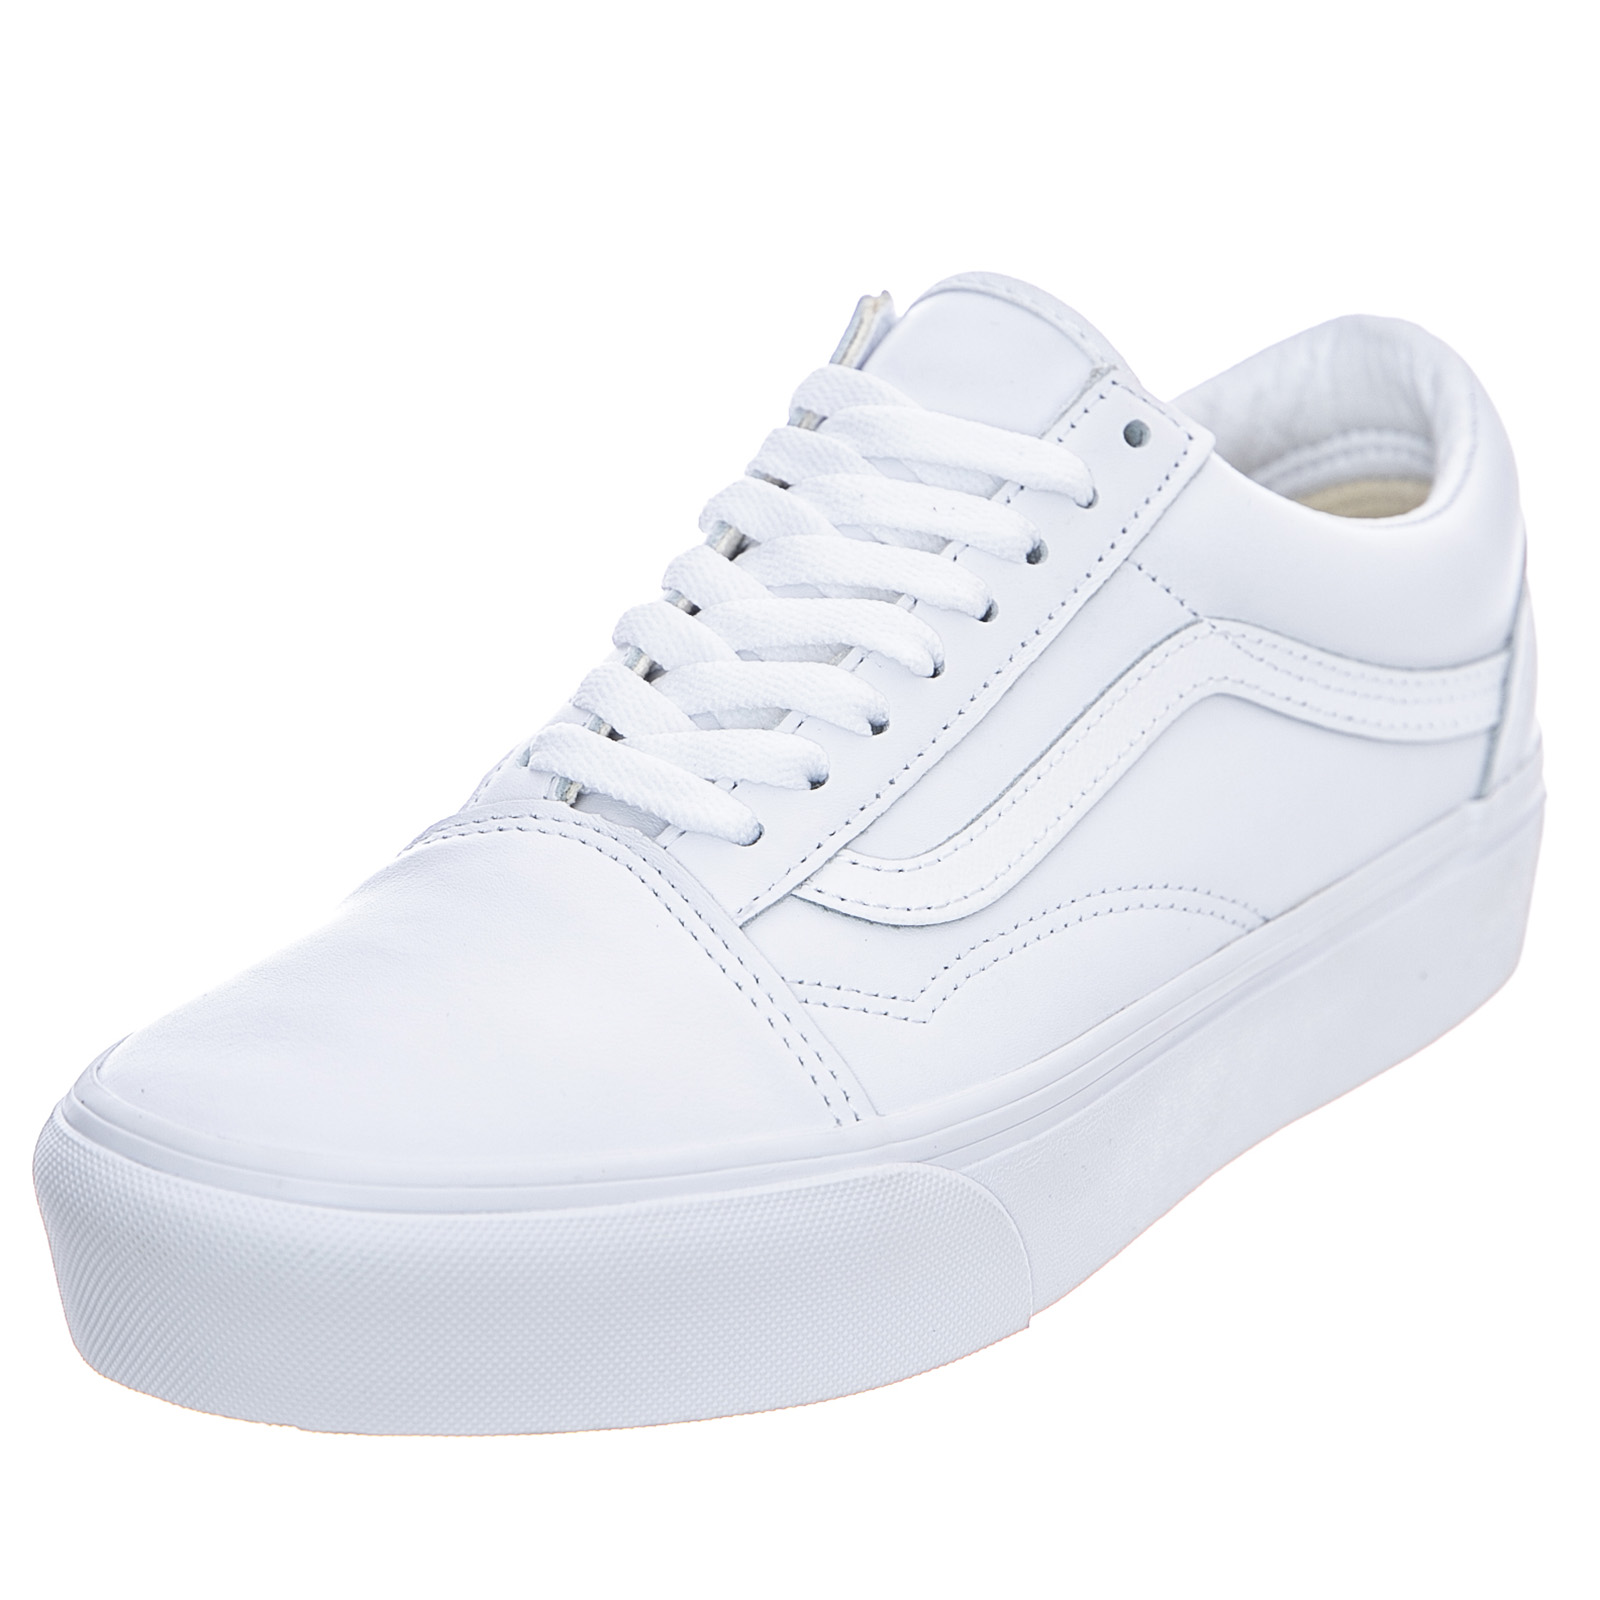 Dettagli su Vans Ua Old Skool Platform White Sneakers Basse UomoDonna Bianco